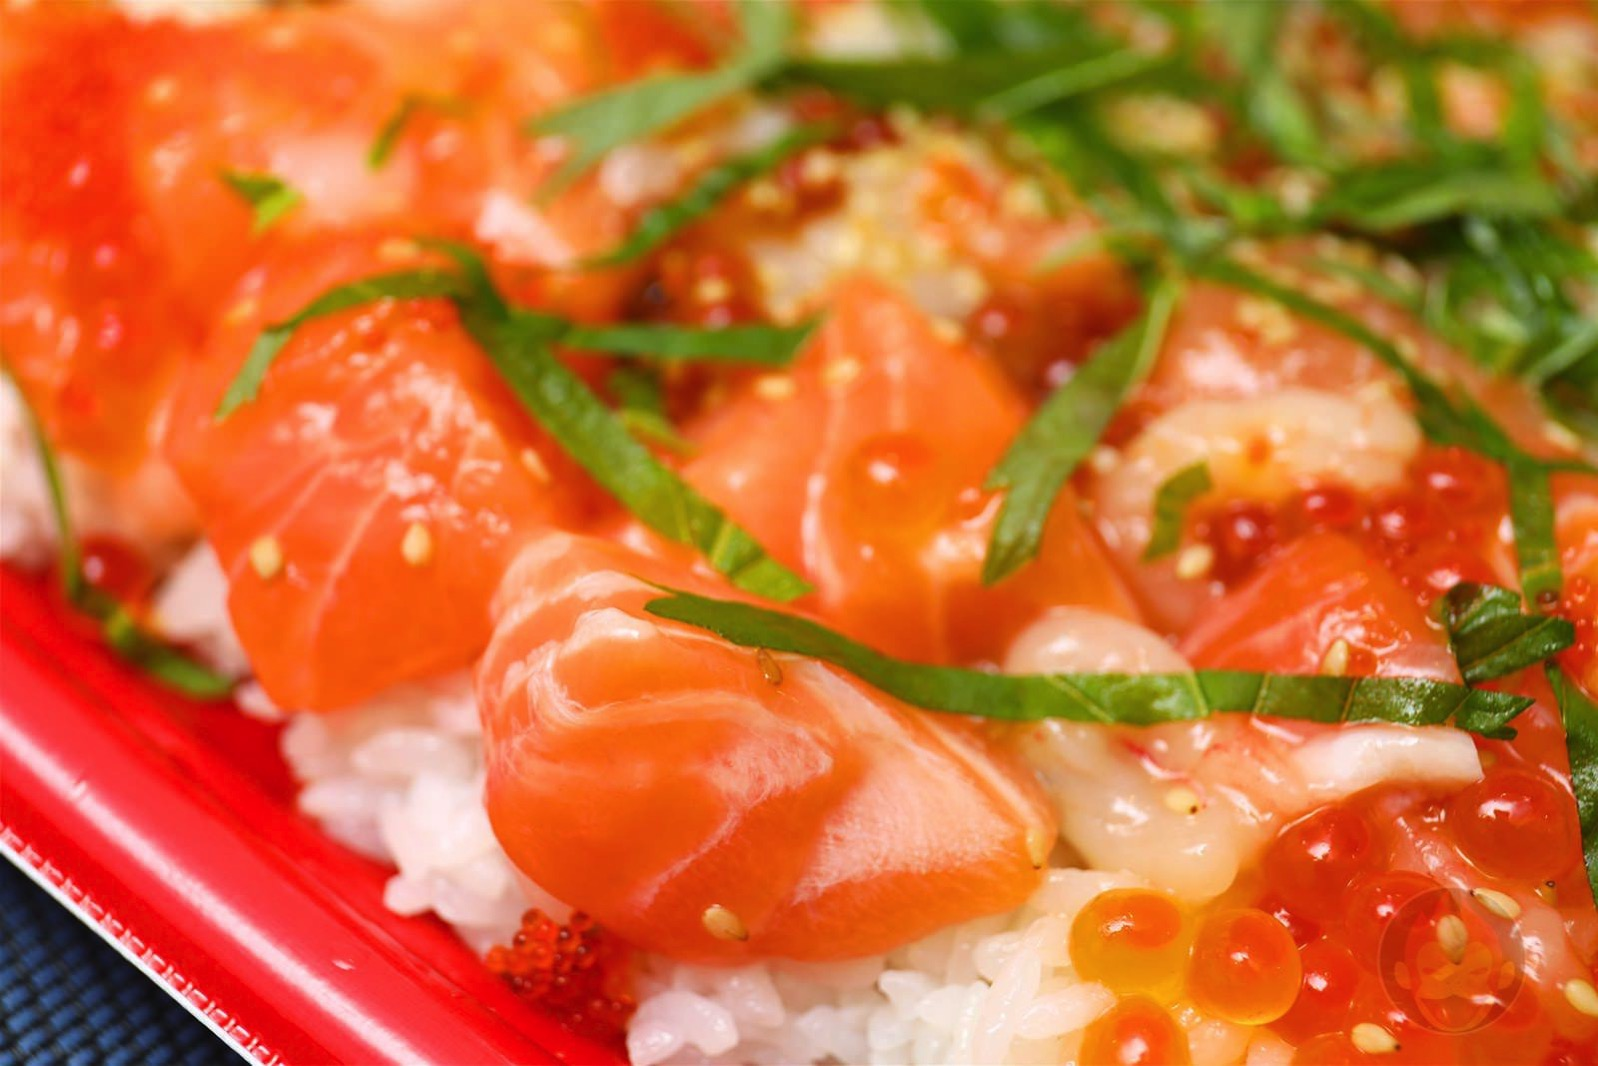 Costco Chirashi Sushi Platter 02